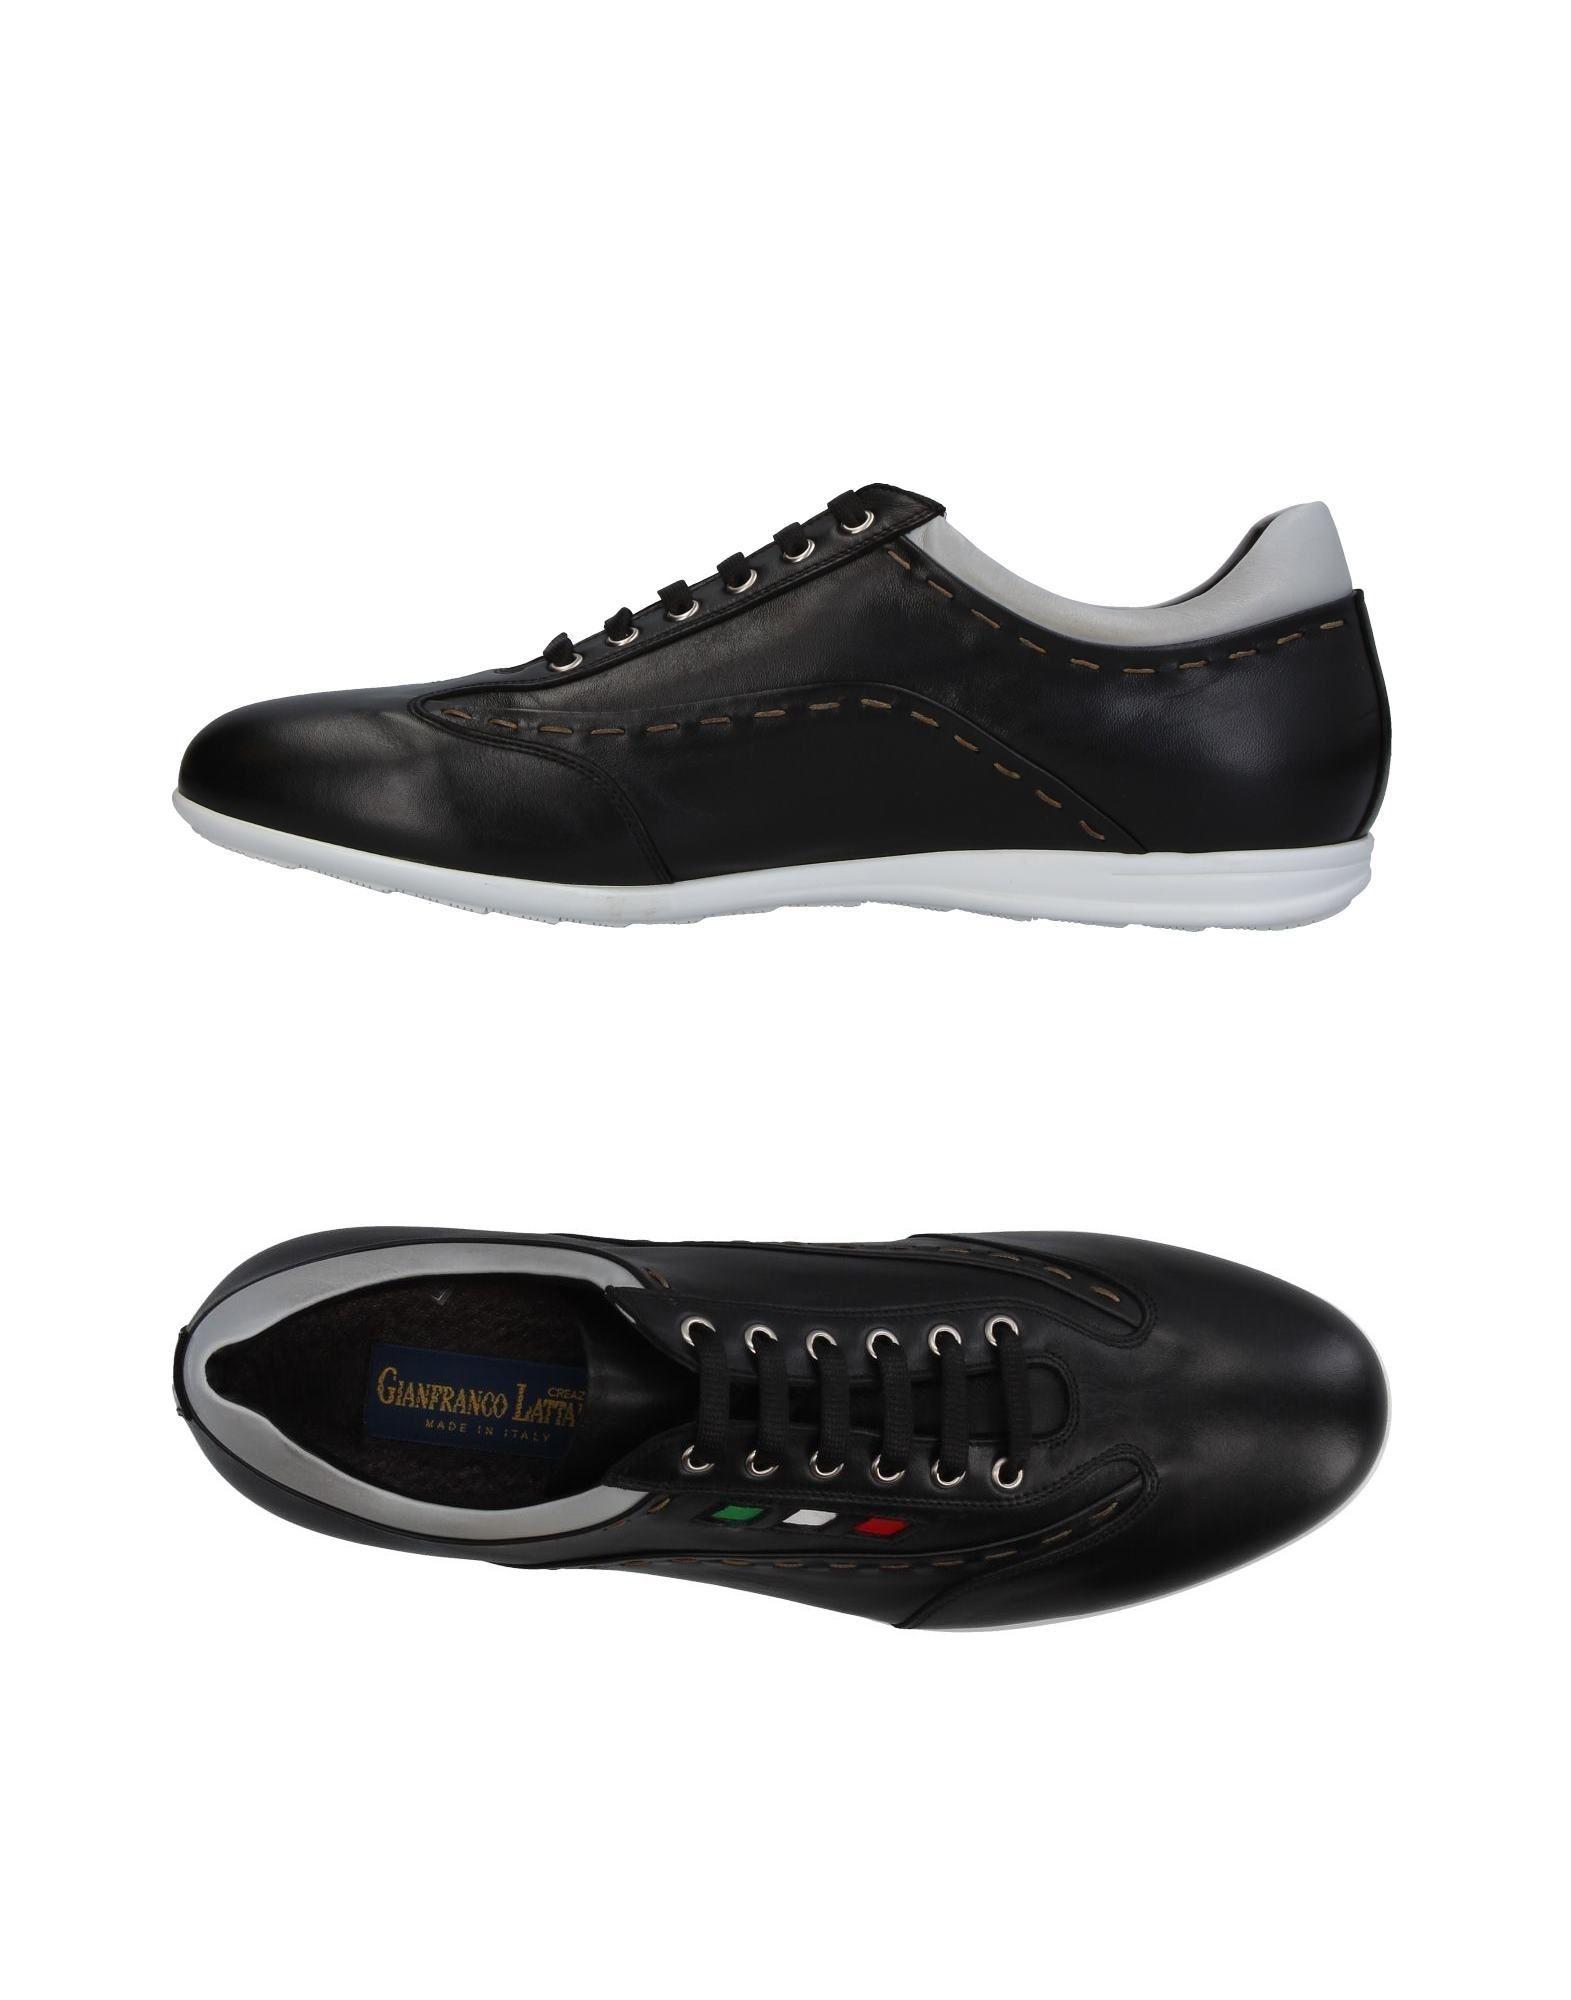 Sneakers Gianfranco Lattanzi Homme - Sneakers Gianfranco Lattanzi  Noir Chaussures casual sauvages